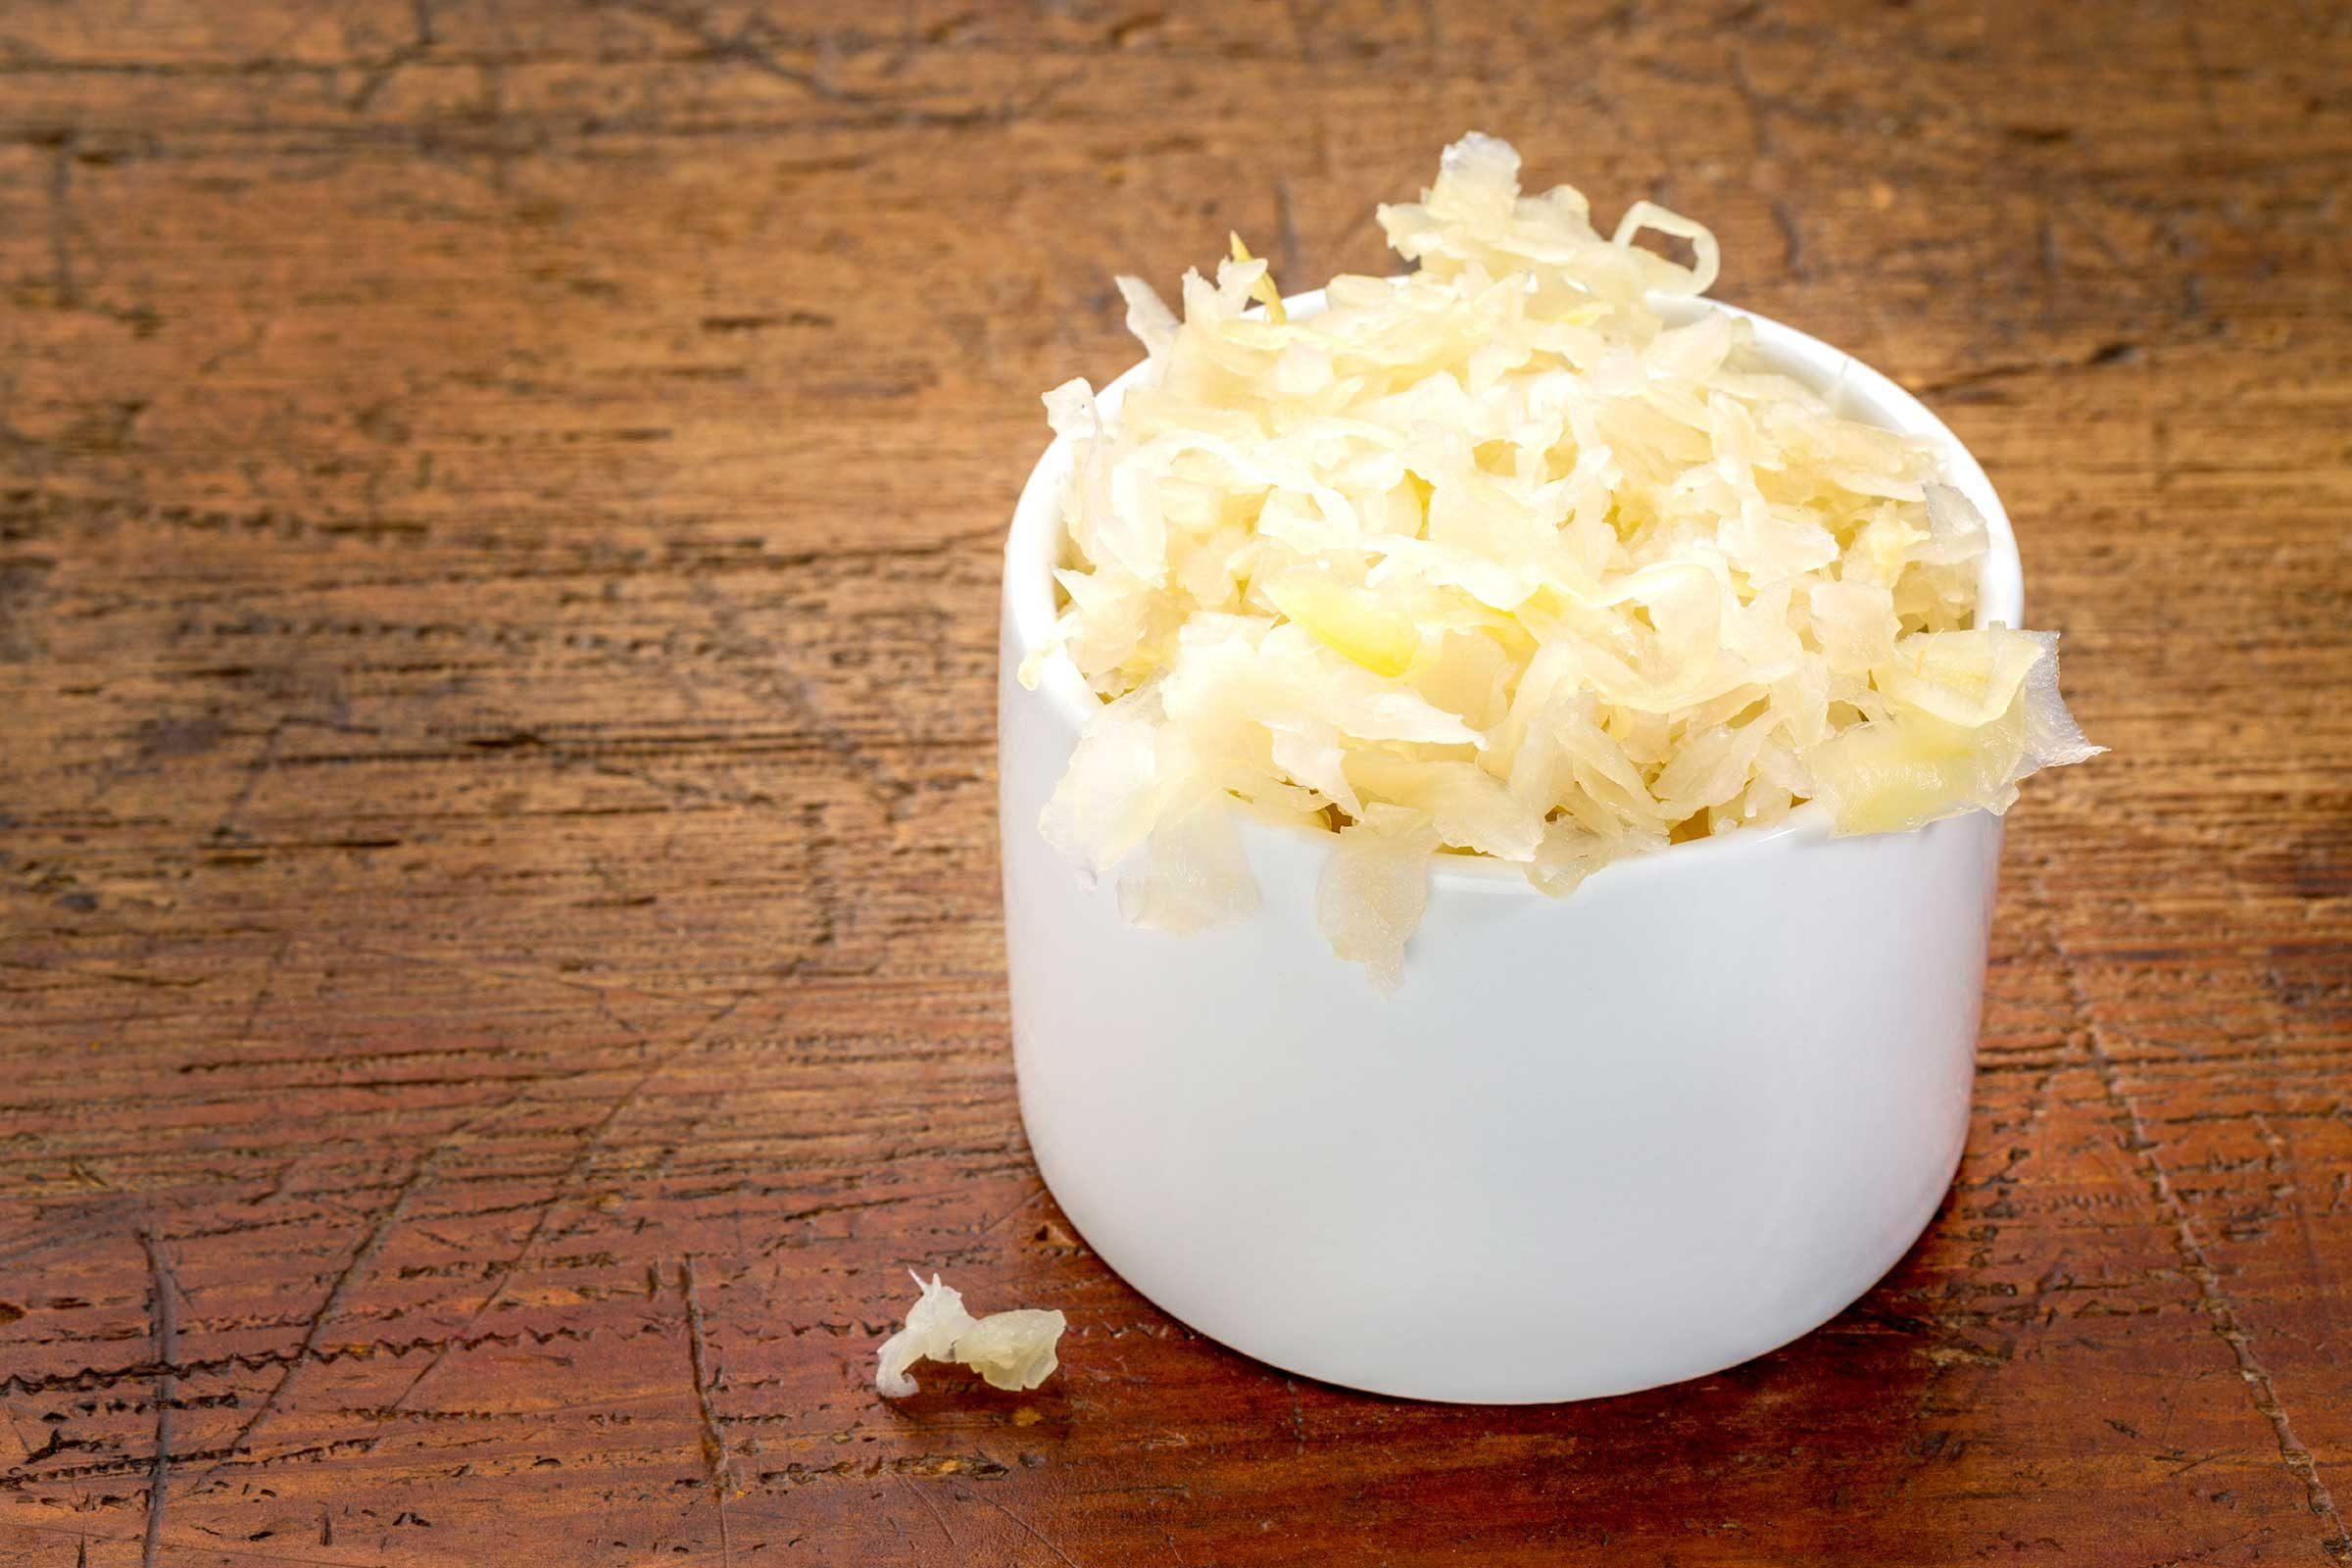 Serve sauerkraut